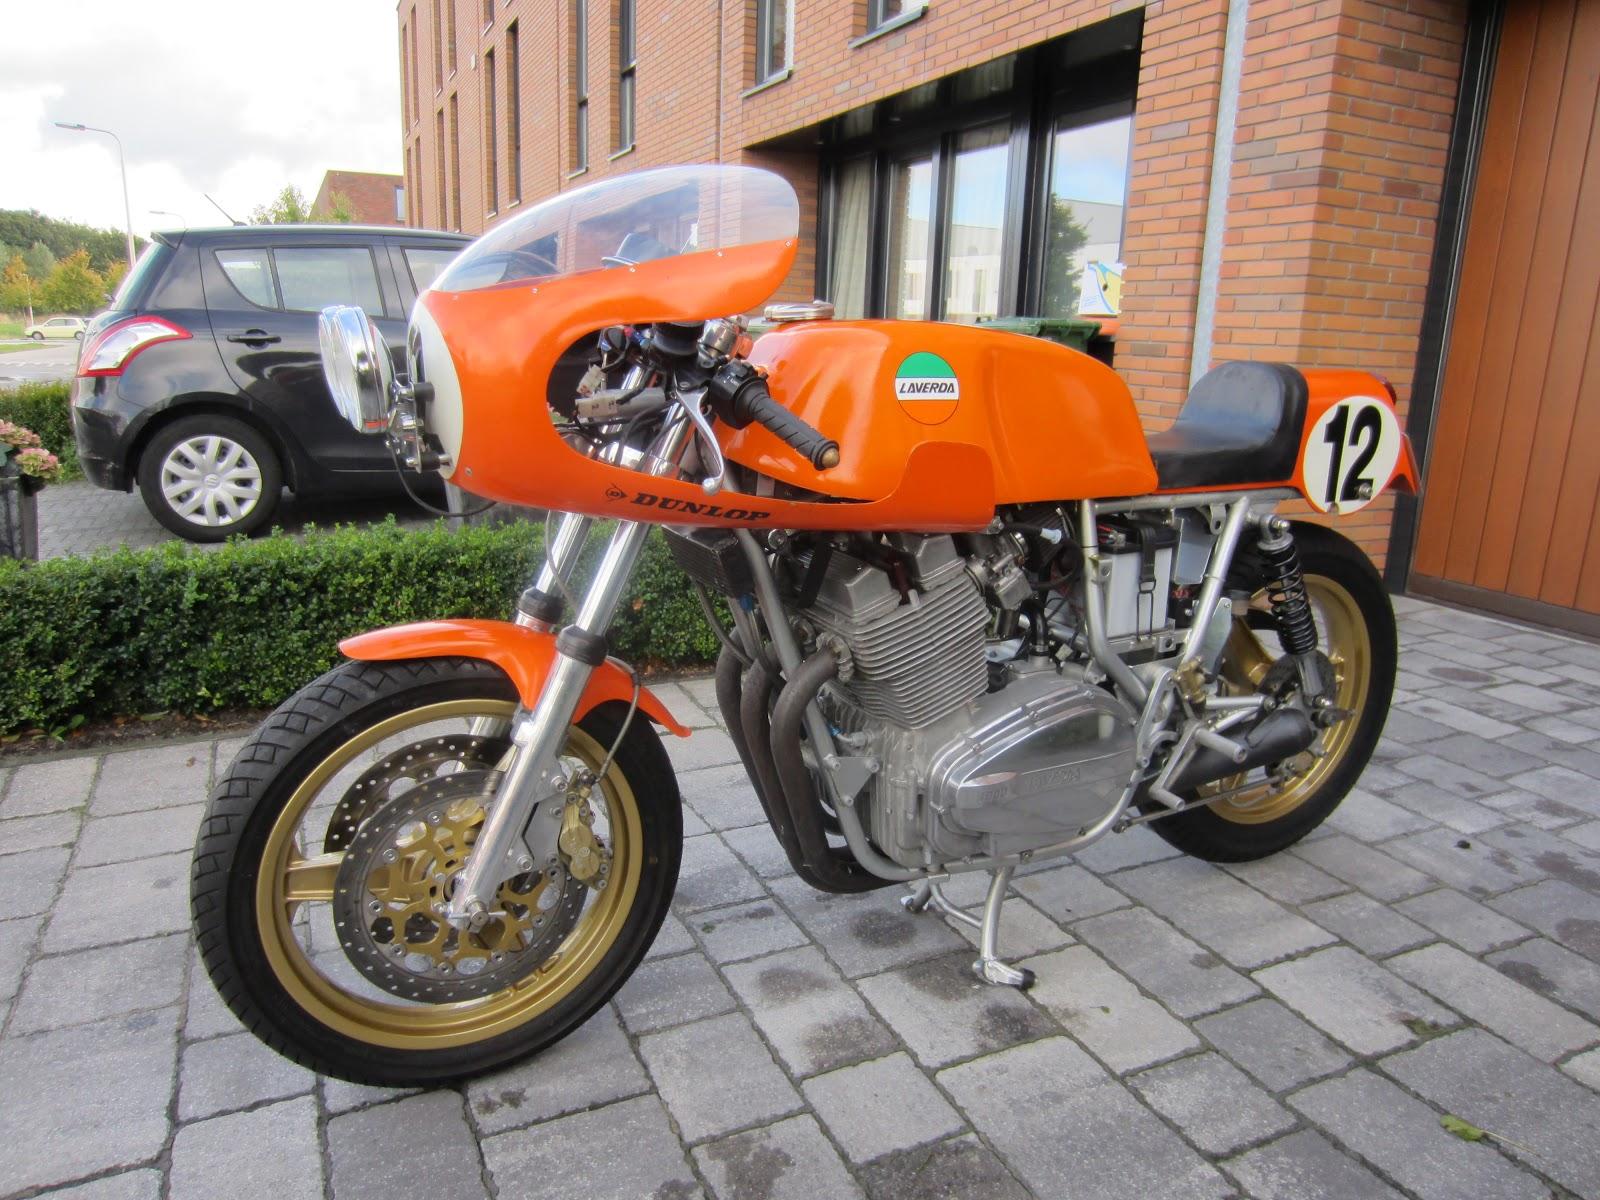 laverda 1000 motorcycle engine diagram evo motorcycle engine diagram dd motorcycles: laverda 1000 endurance racer #14